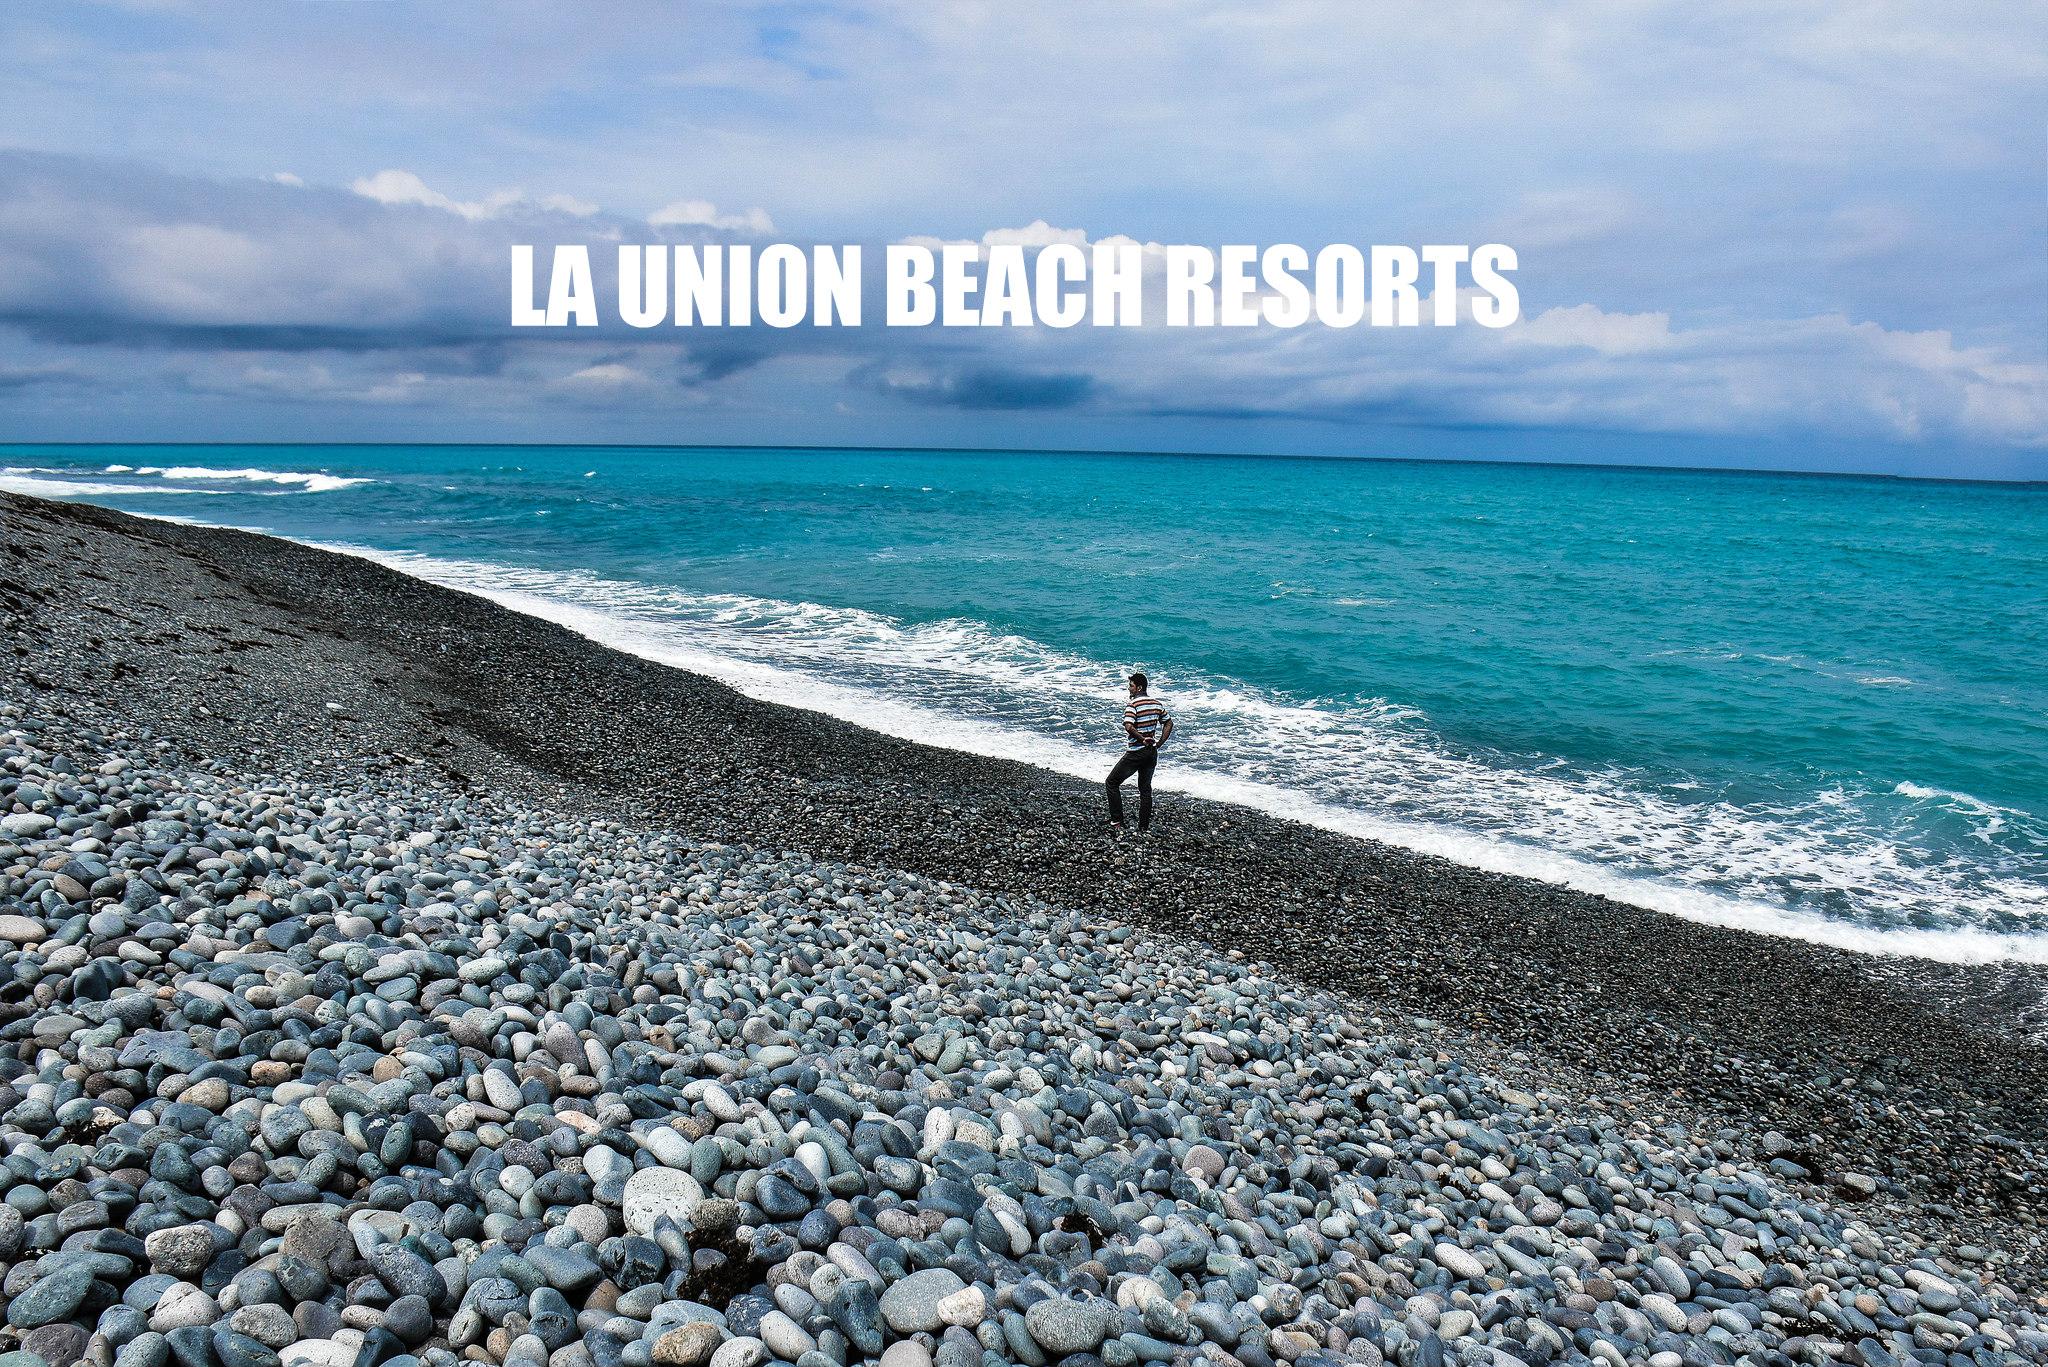 LA UNION BEACH RESORTS